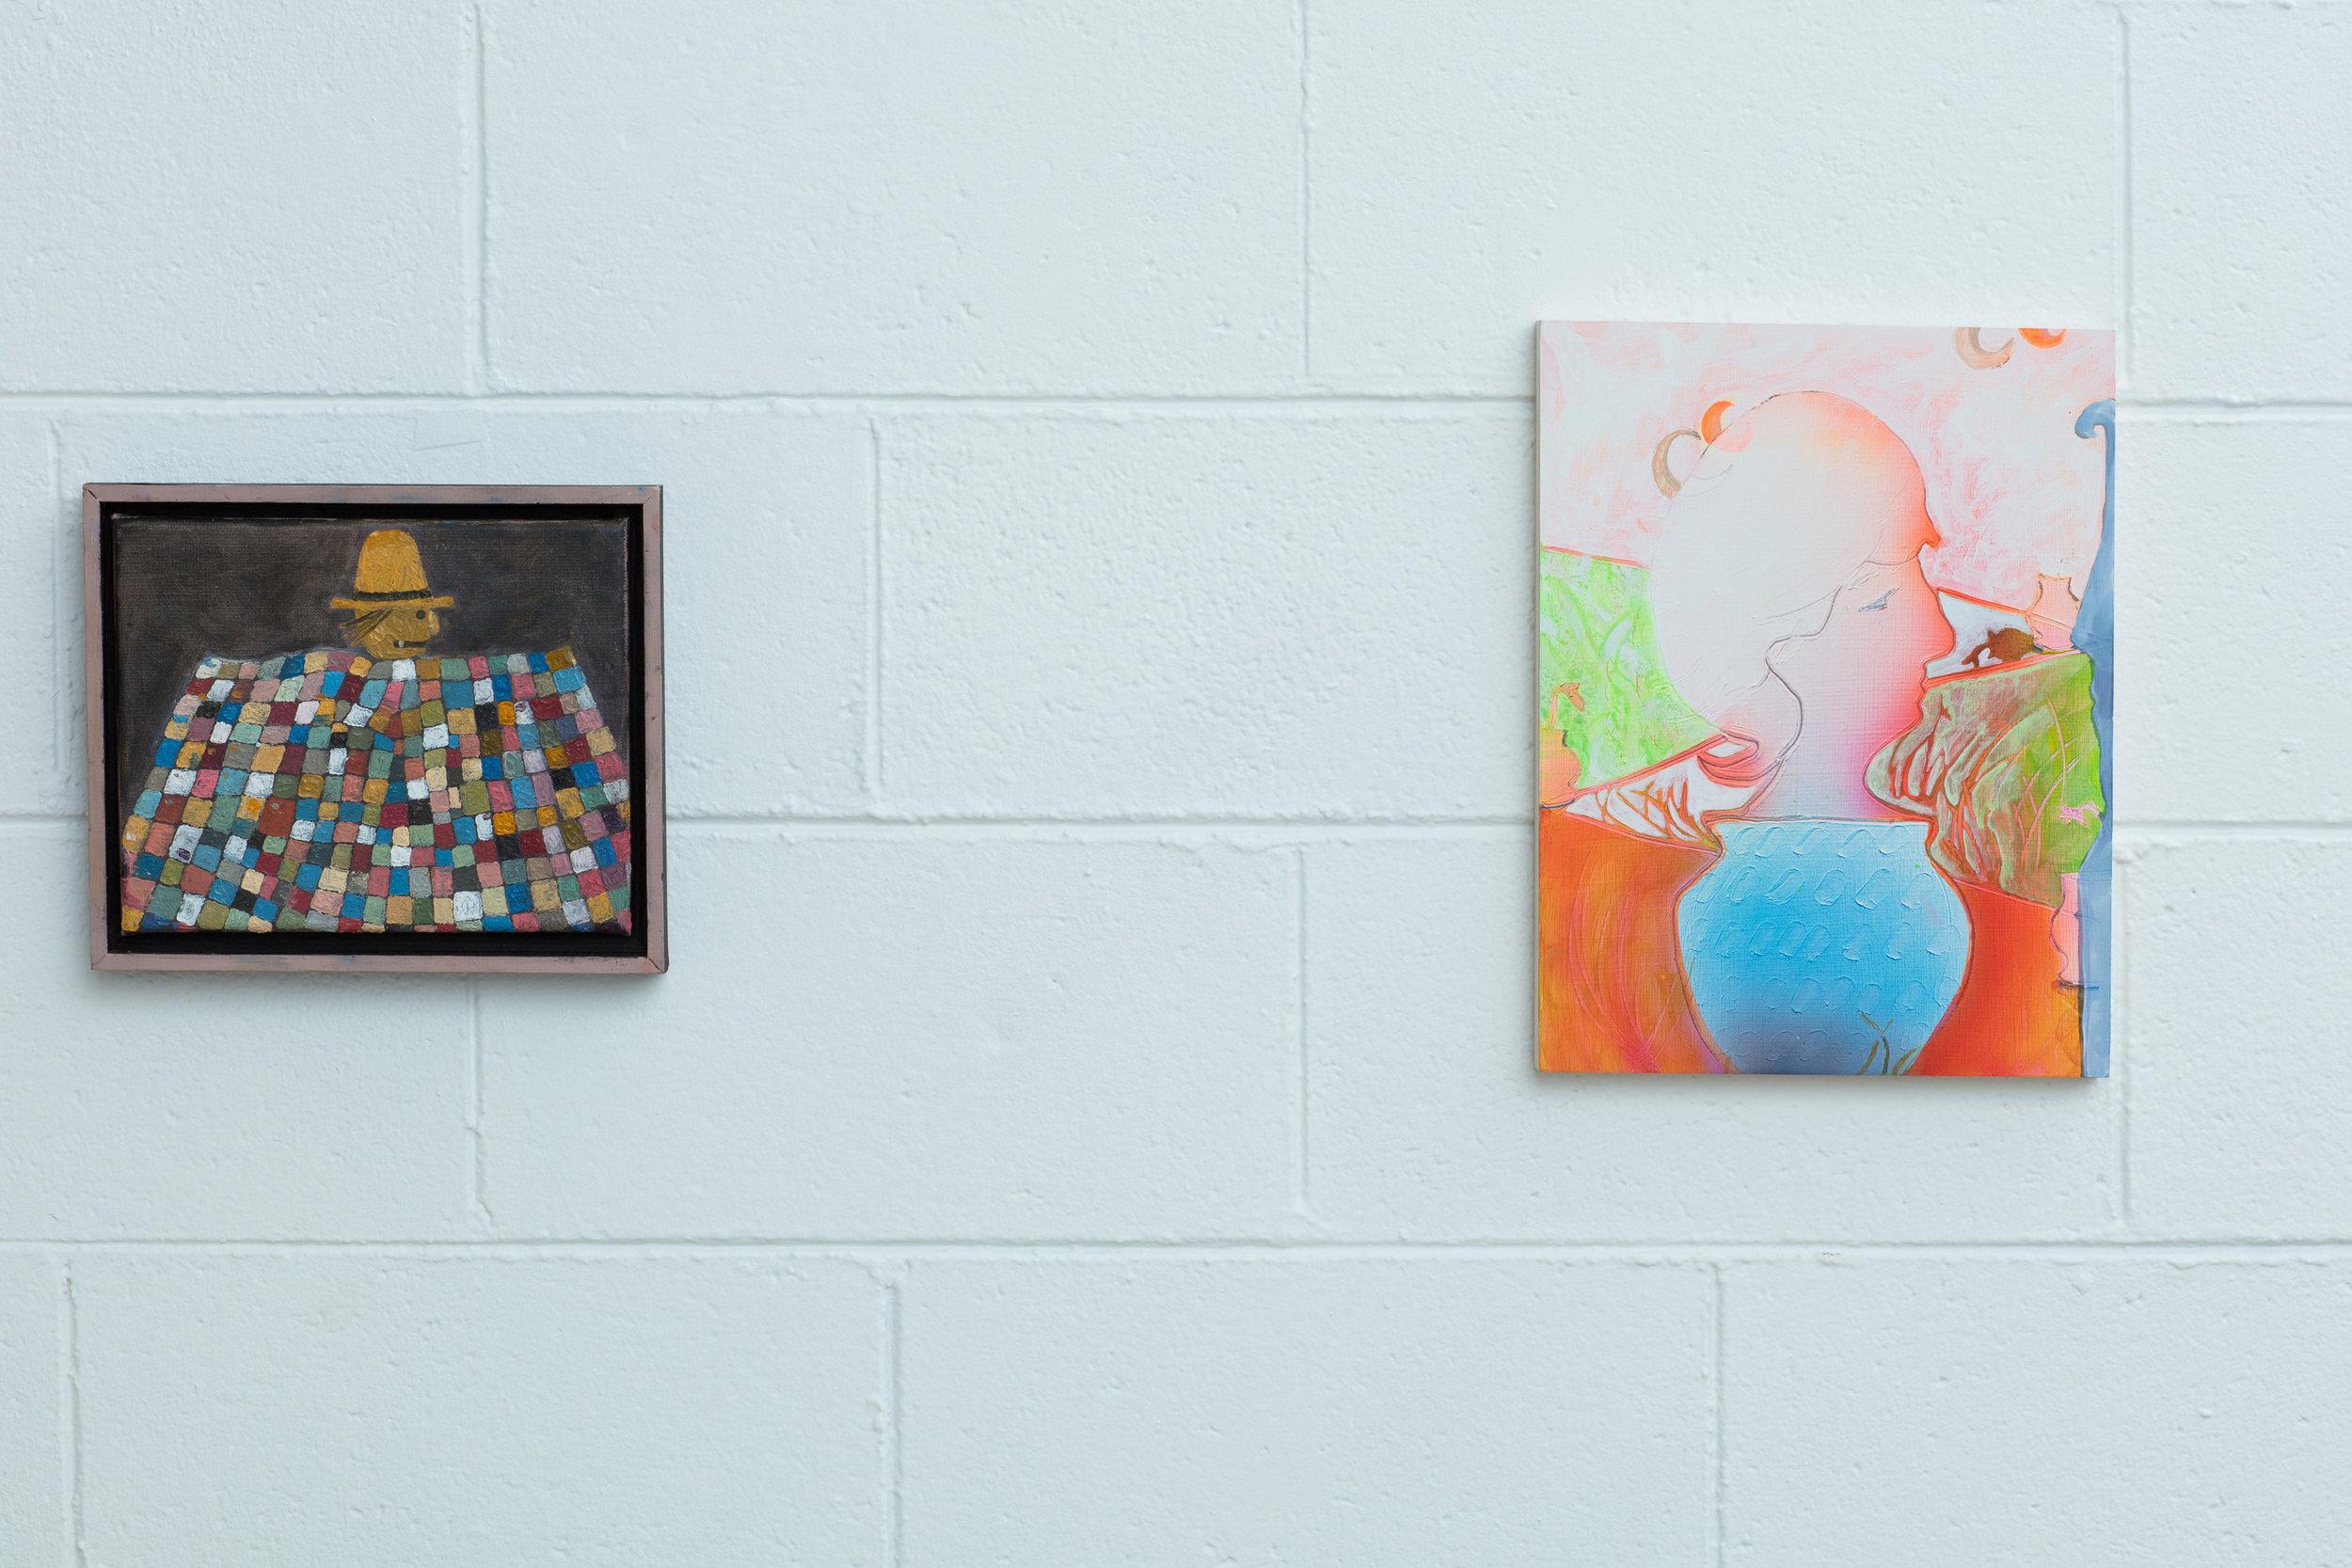 "Left: Scott Daniel Ellison  Scarecrow  Oil on canvas 8"" X 10"" 2017  Right: Catherine Haggarty  Plant Portrait as Sculpture  Fluid acrylic on panel 12"" X 9"" 2017"